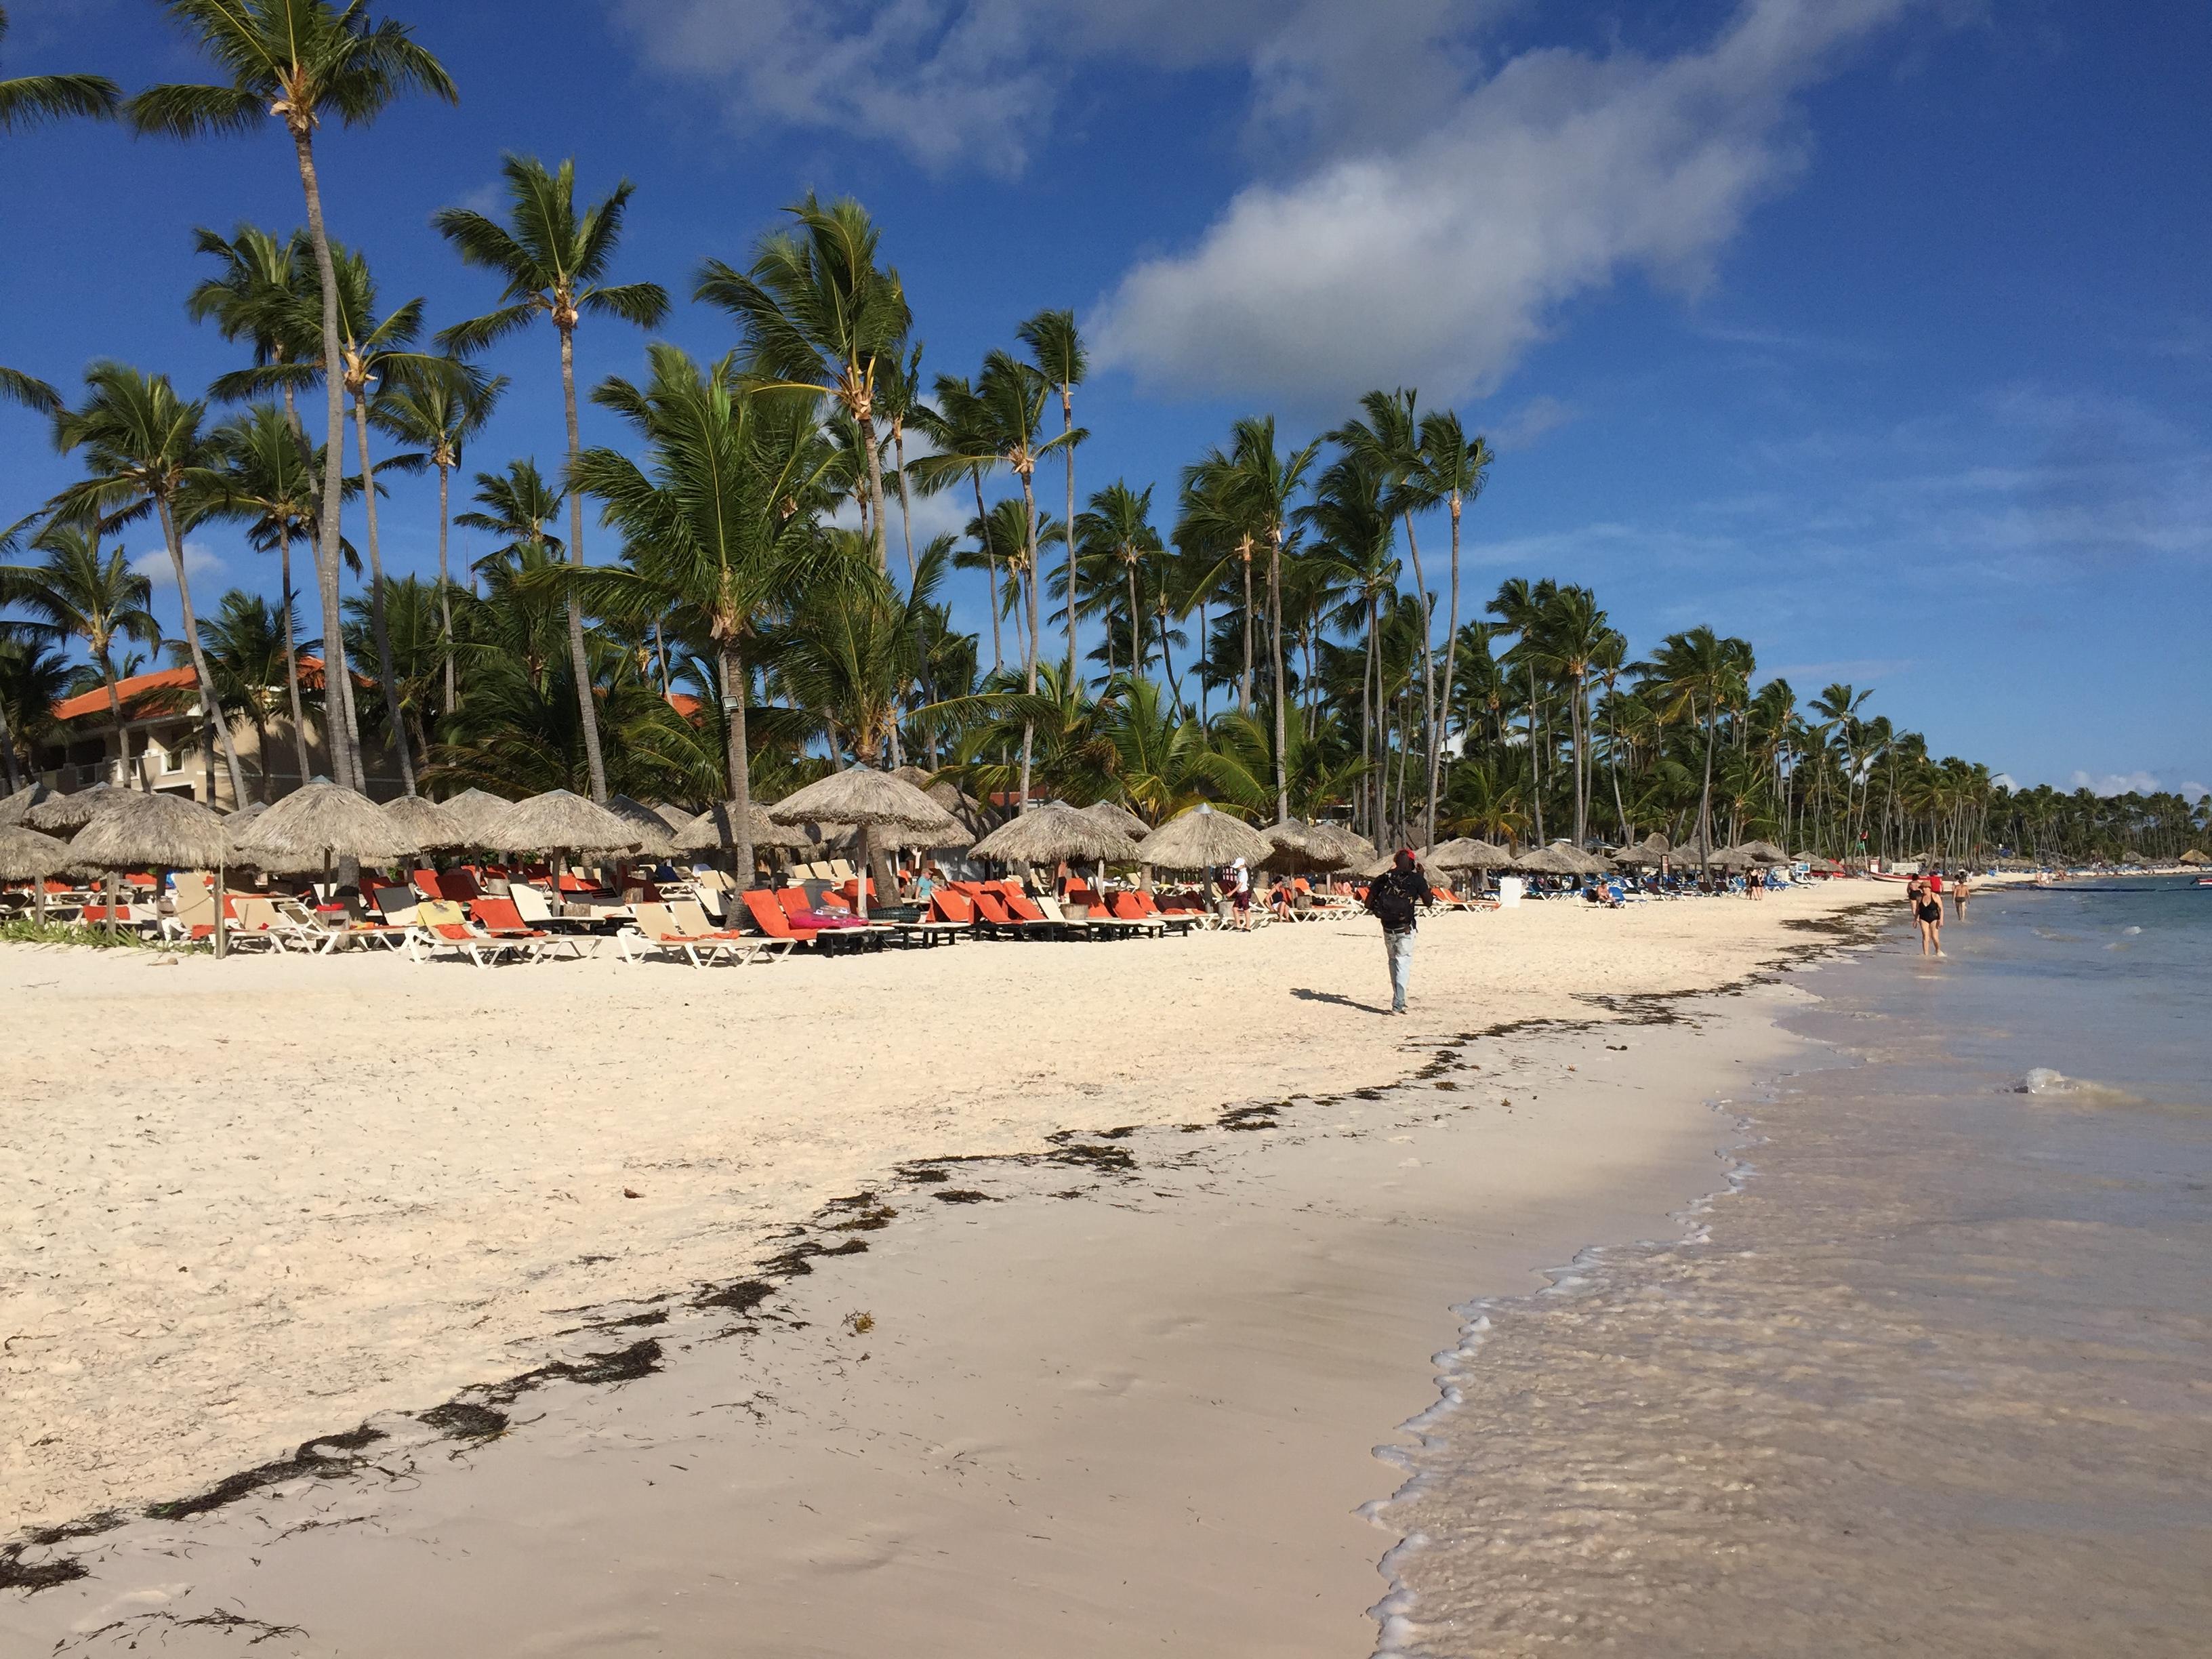 Dreams Palm Beach Punta Cana - Luxury All Inclusive in Punta Cana